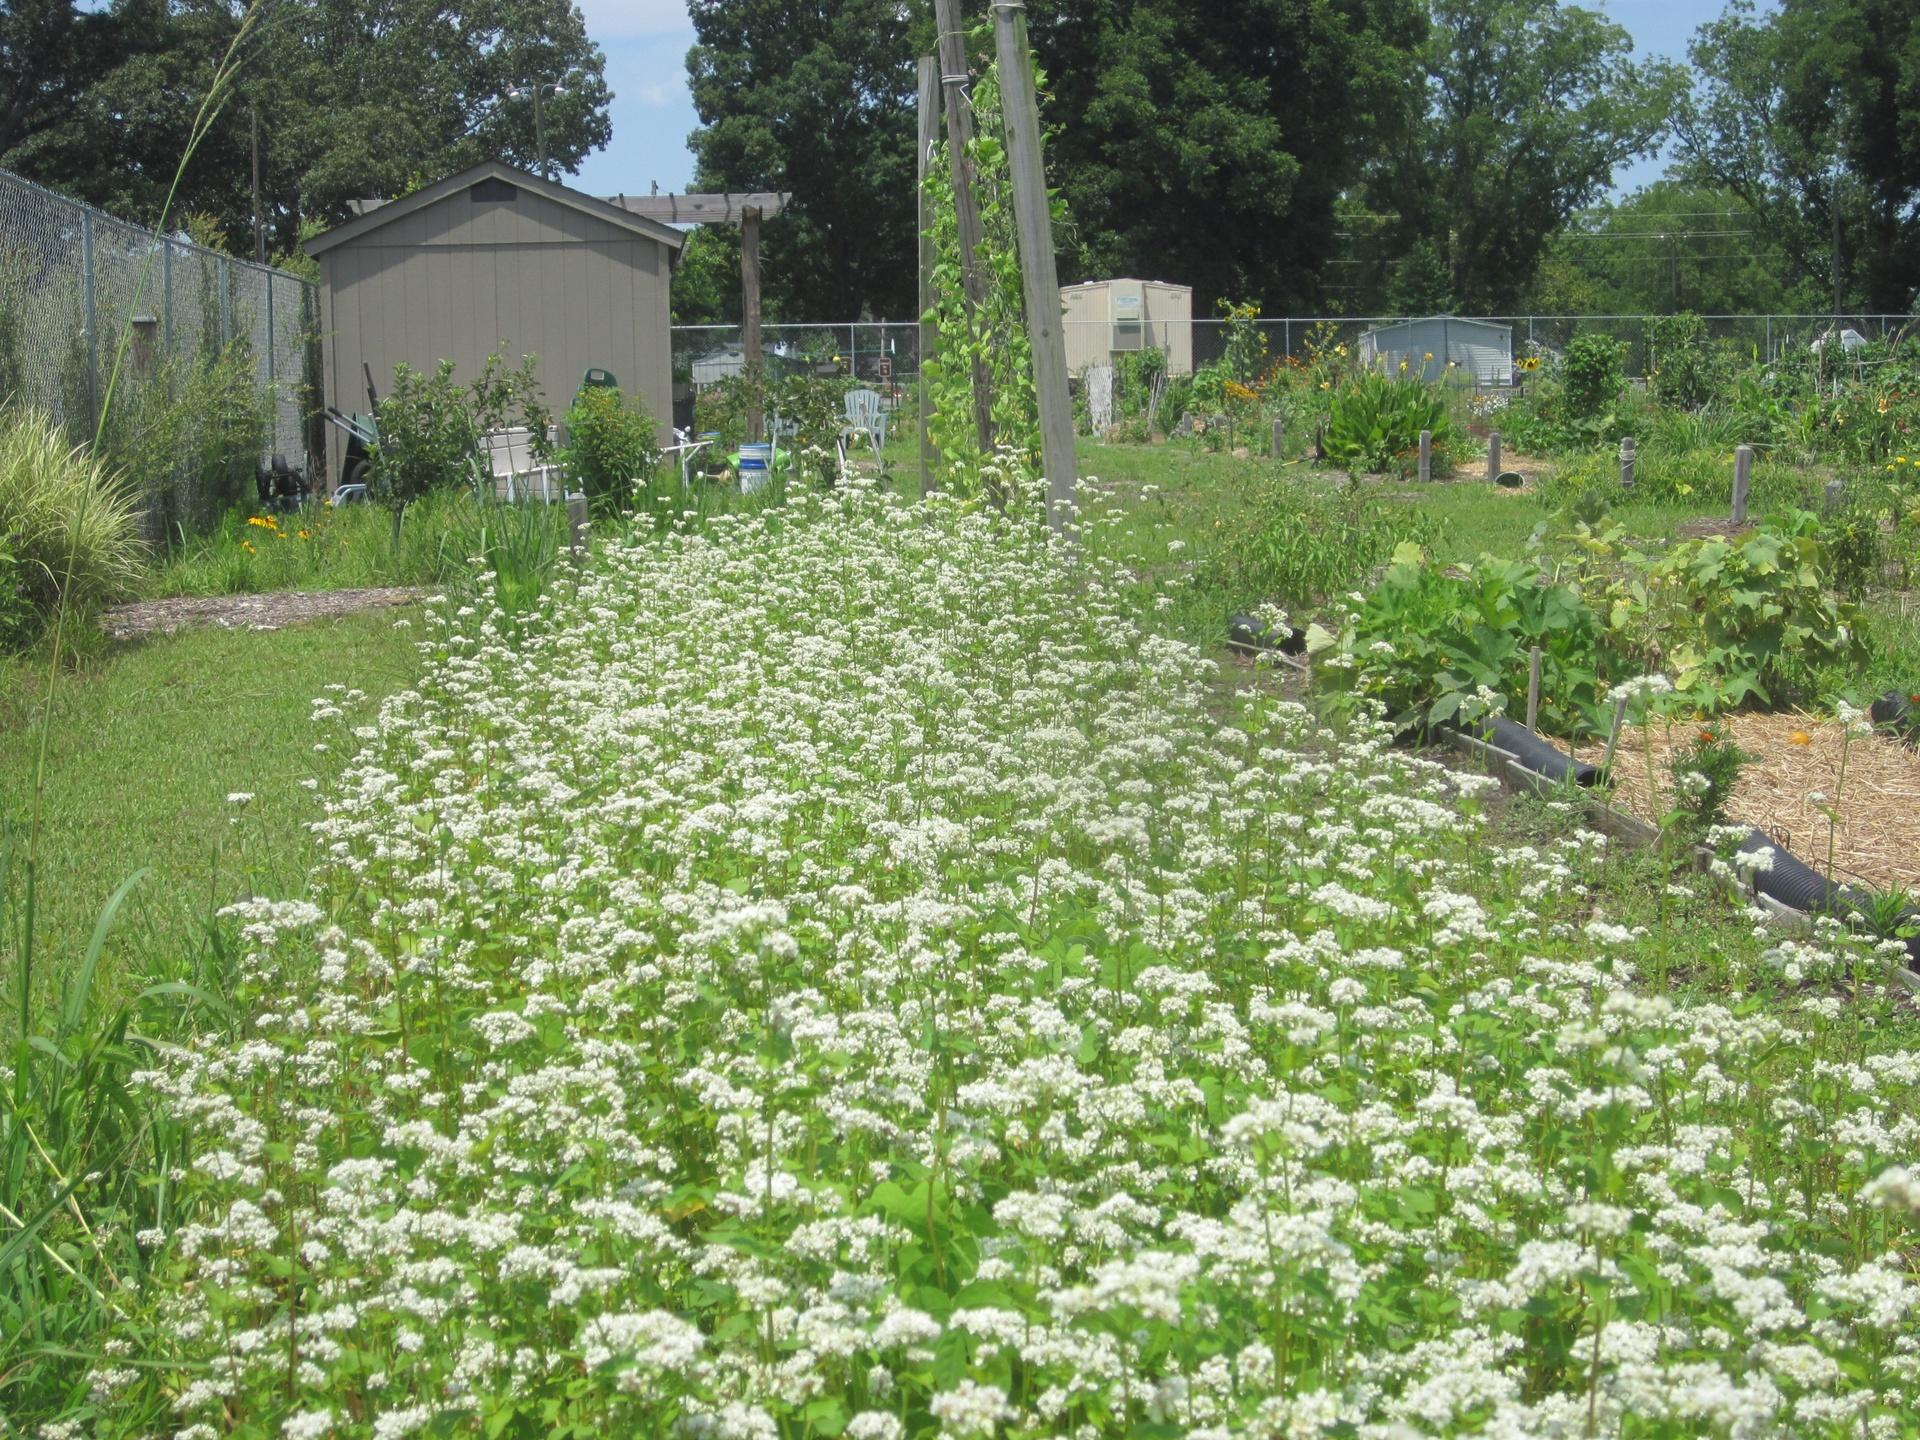 Buckwheat flowering